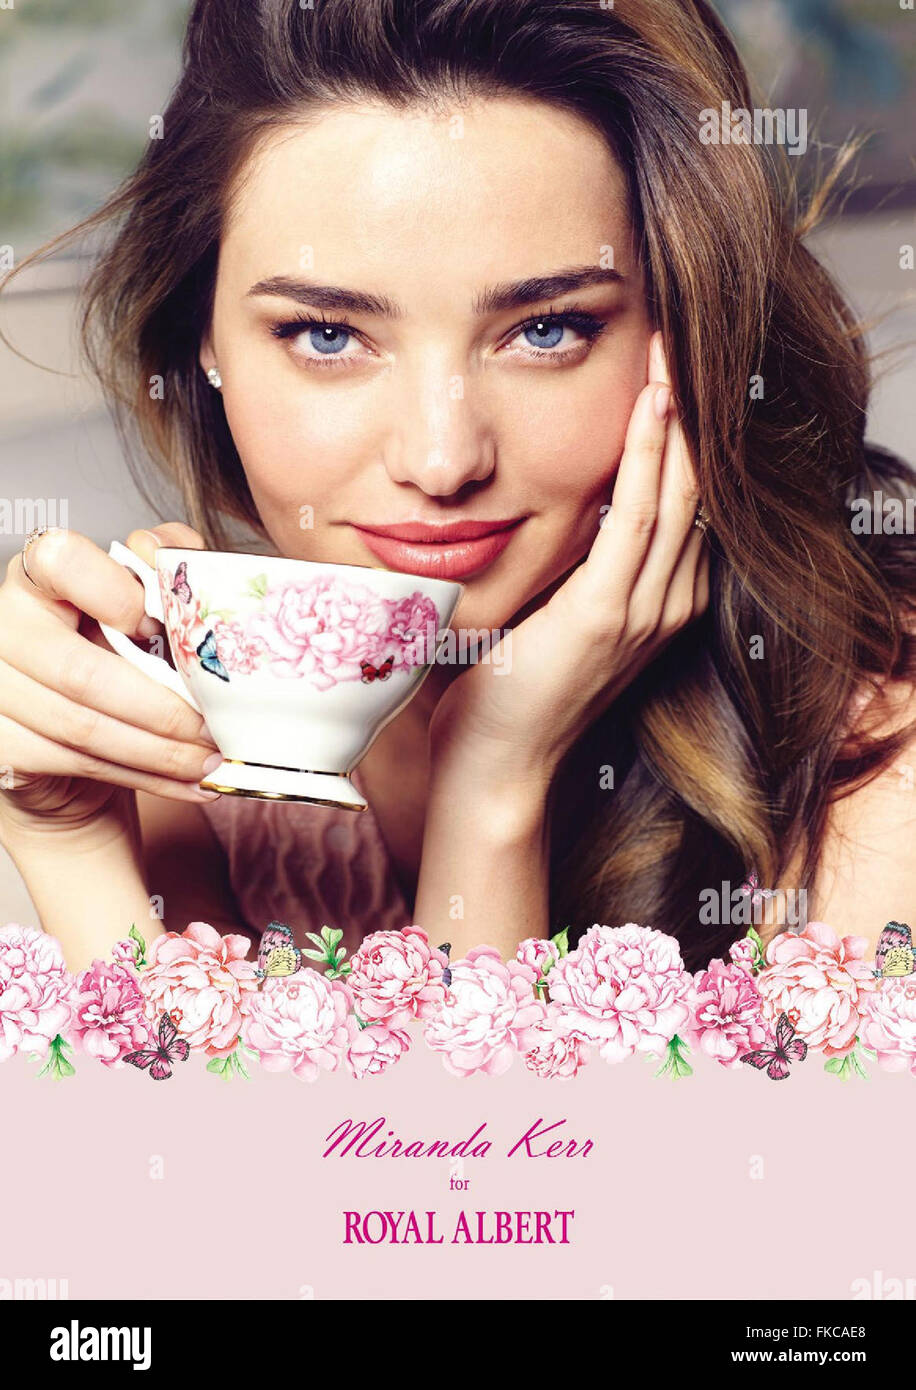 2010s UK Royal Albert Magazine Advert - Stock Image